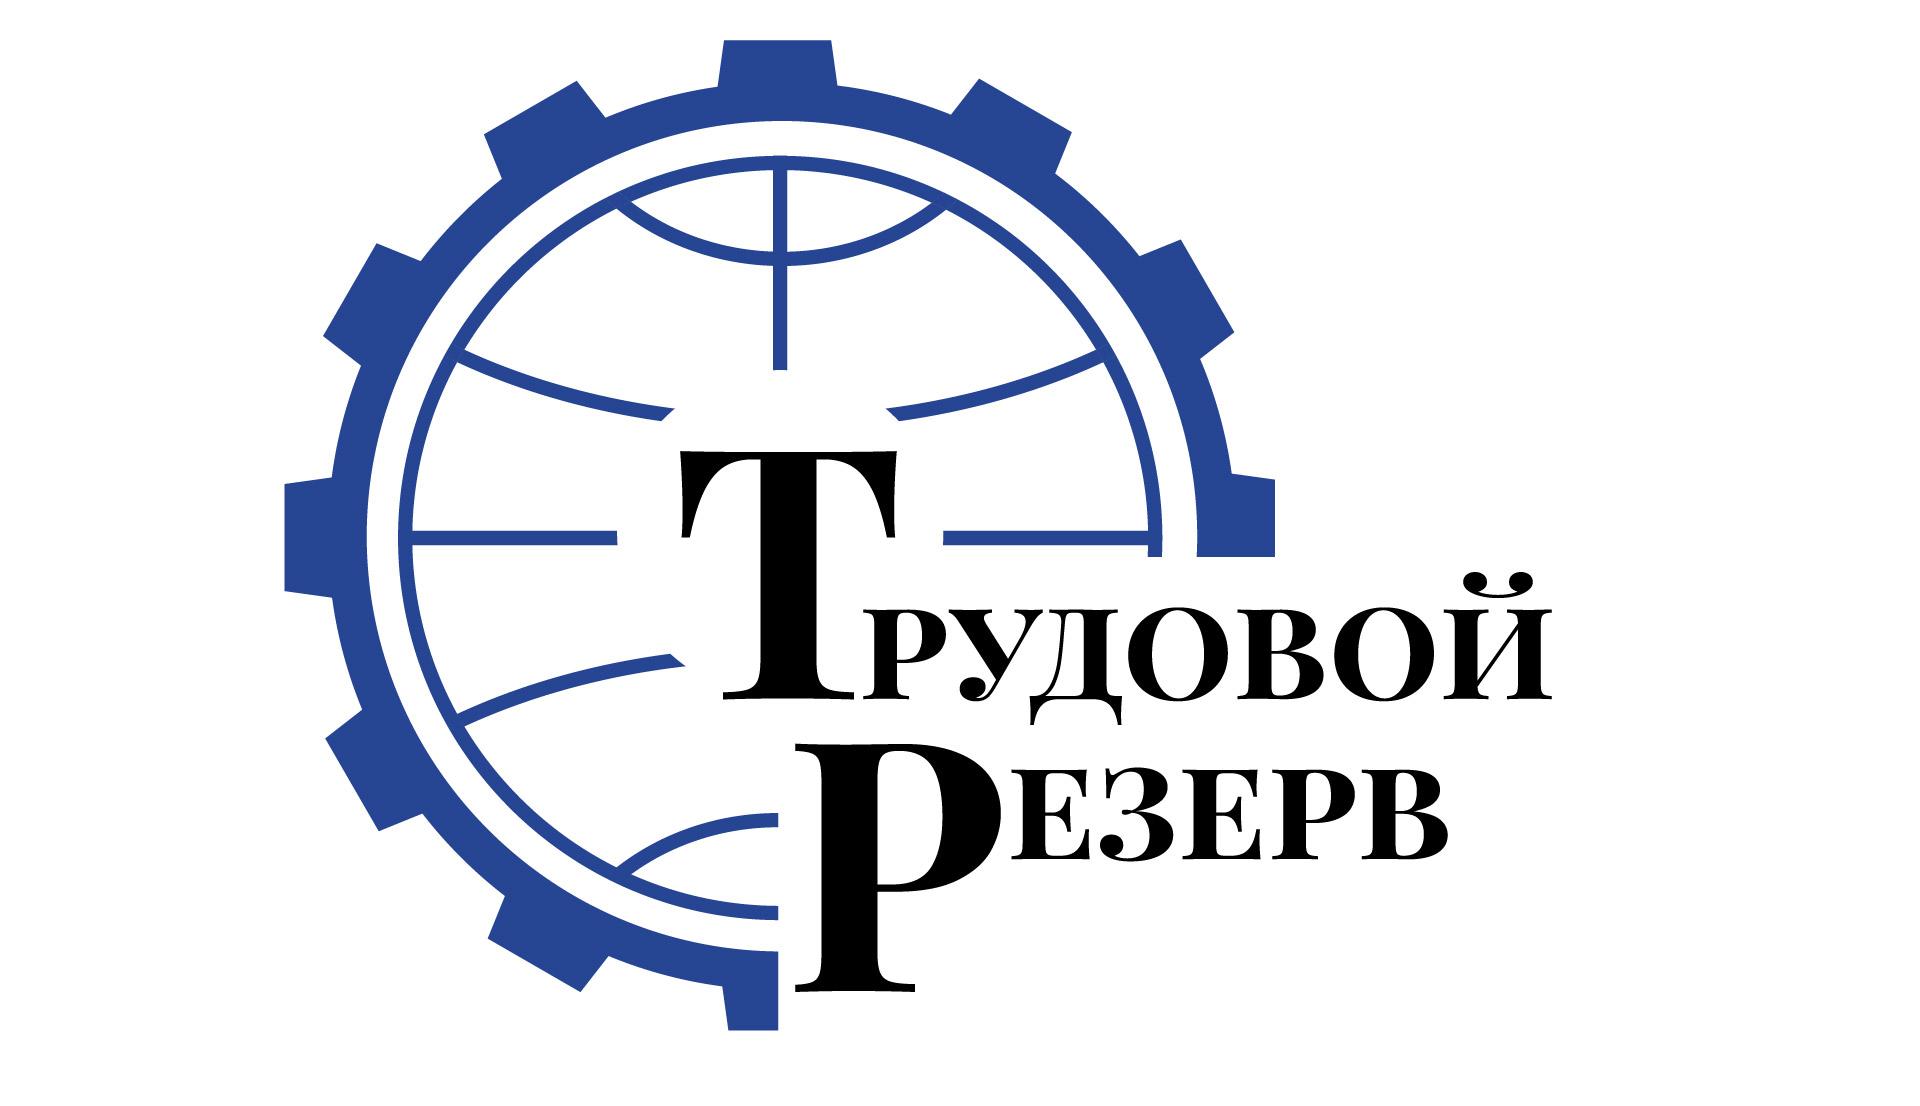 Работа в компании «Трудовой резерв» в Лобни